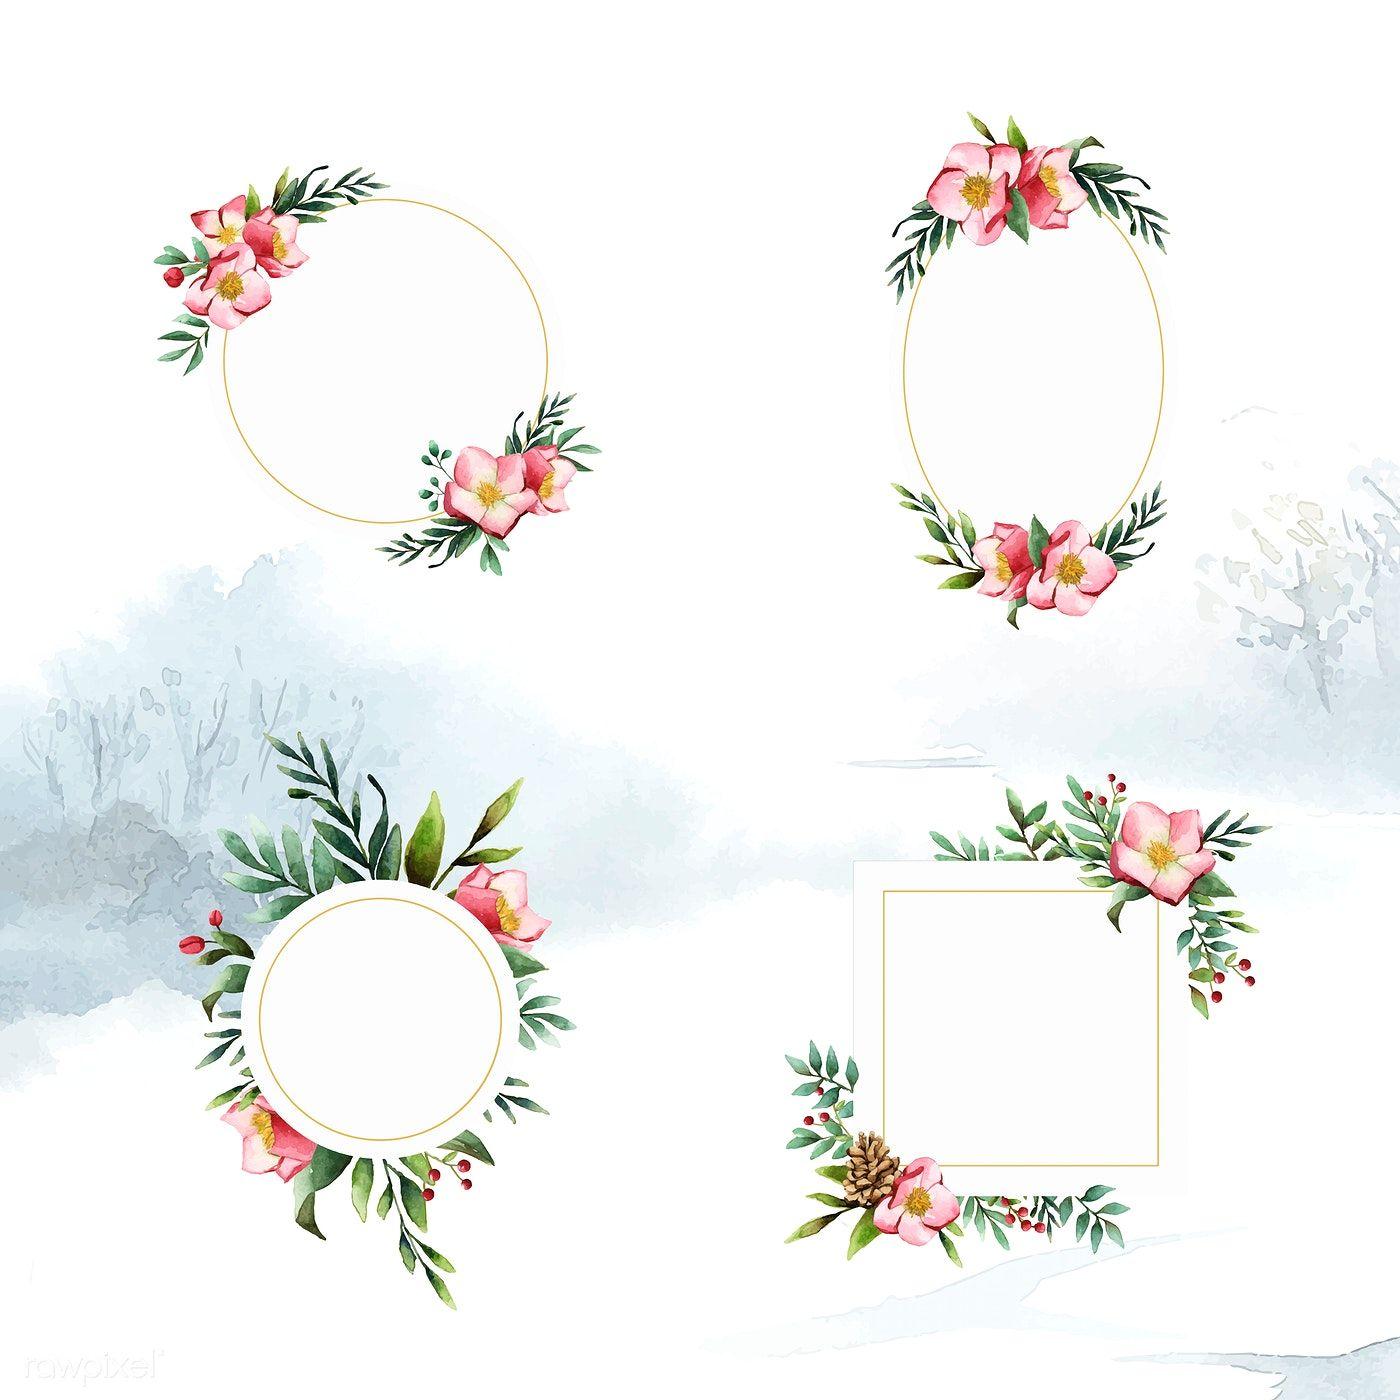 Set of Hellebore flower frames painted by watercolor